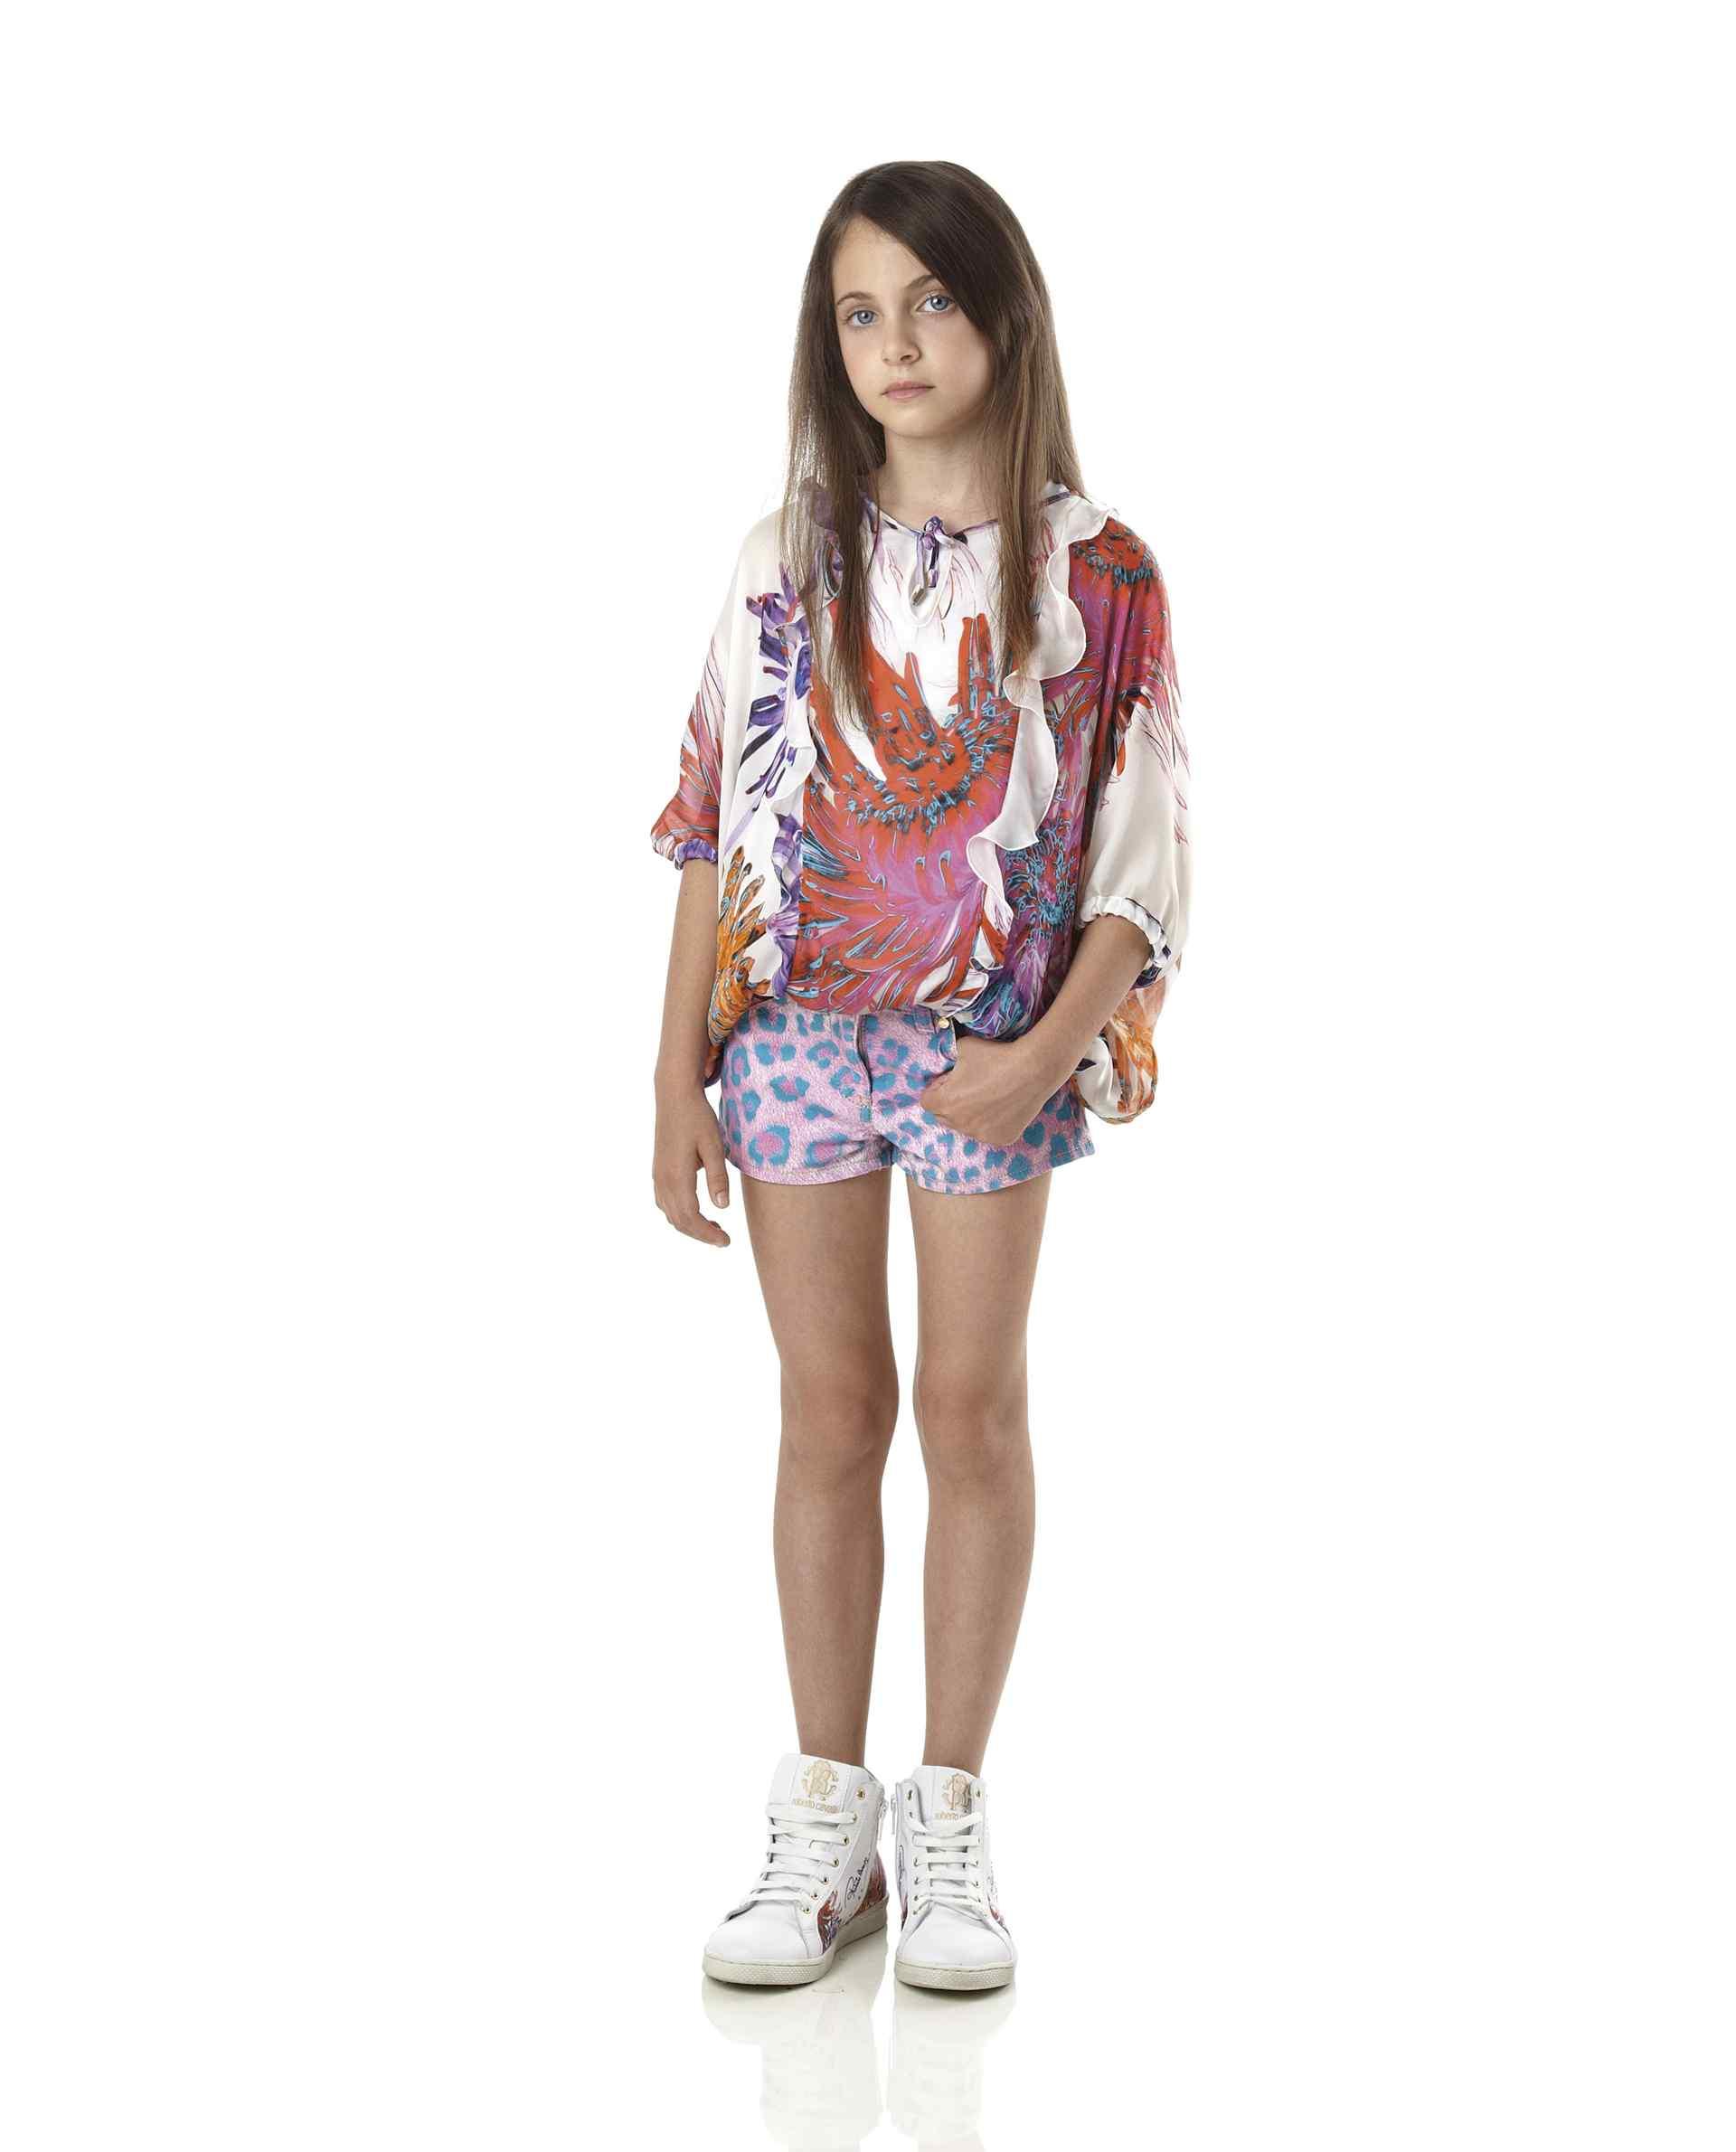 Roberto Cavalli Junior Spring Summer 2014, Tropical Flowers blouse